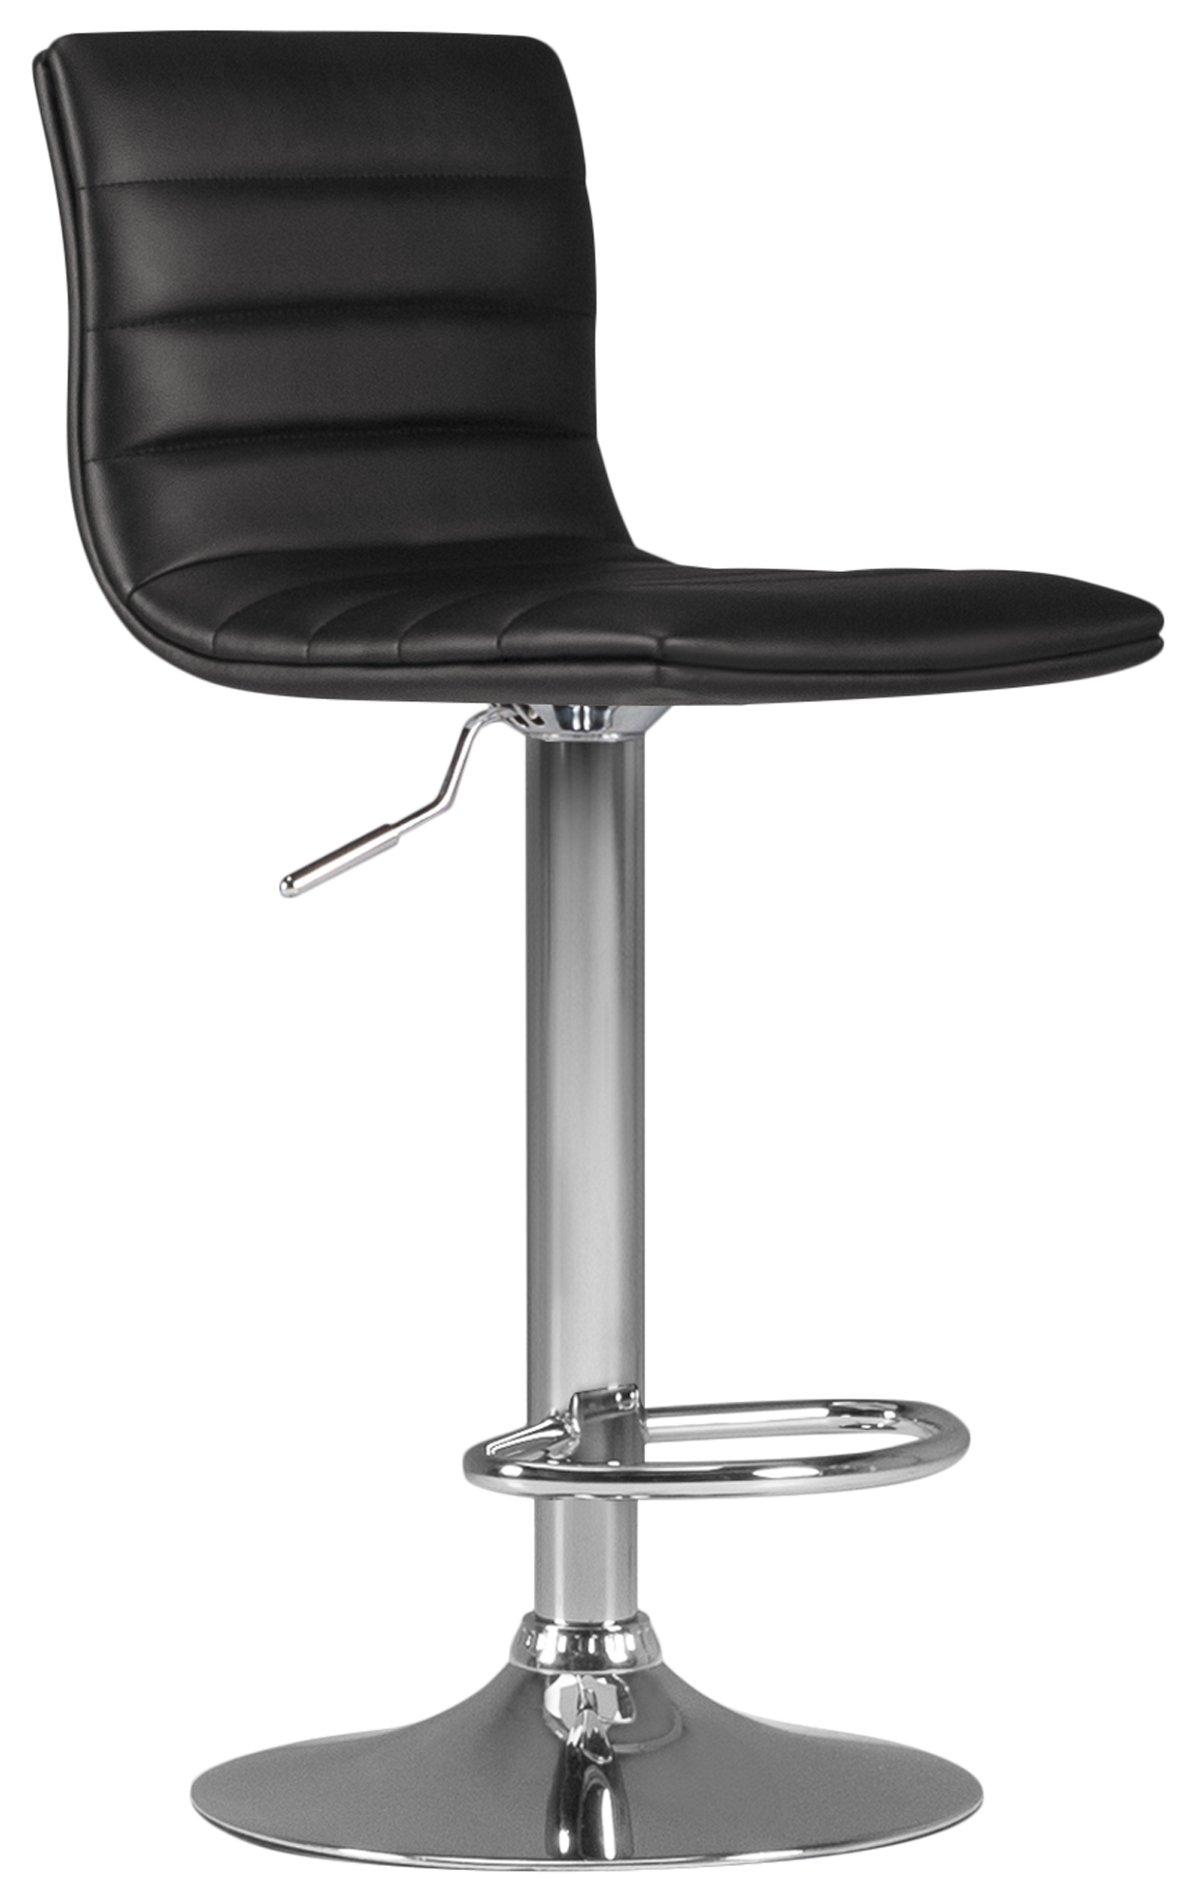 Motivo Black Upholstered Adjustable Stool